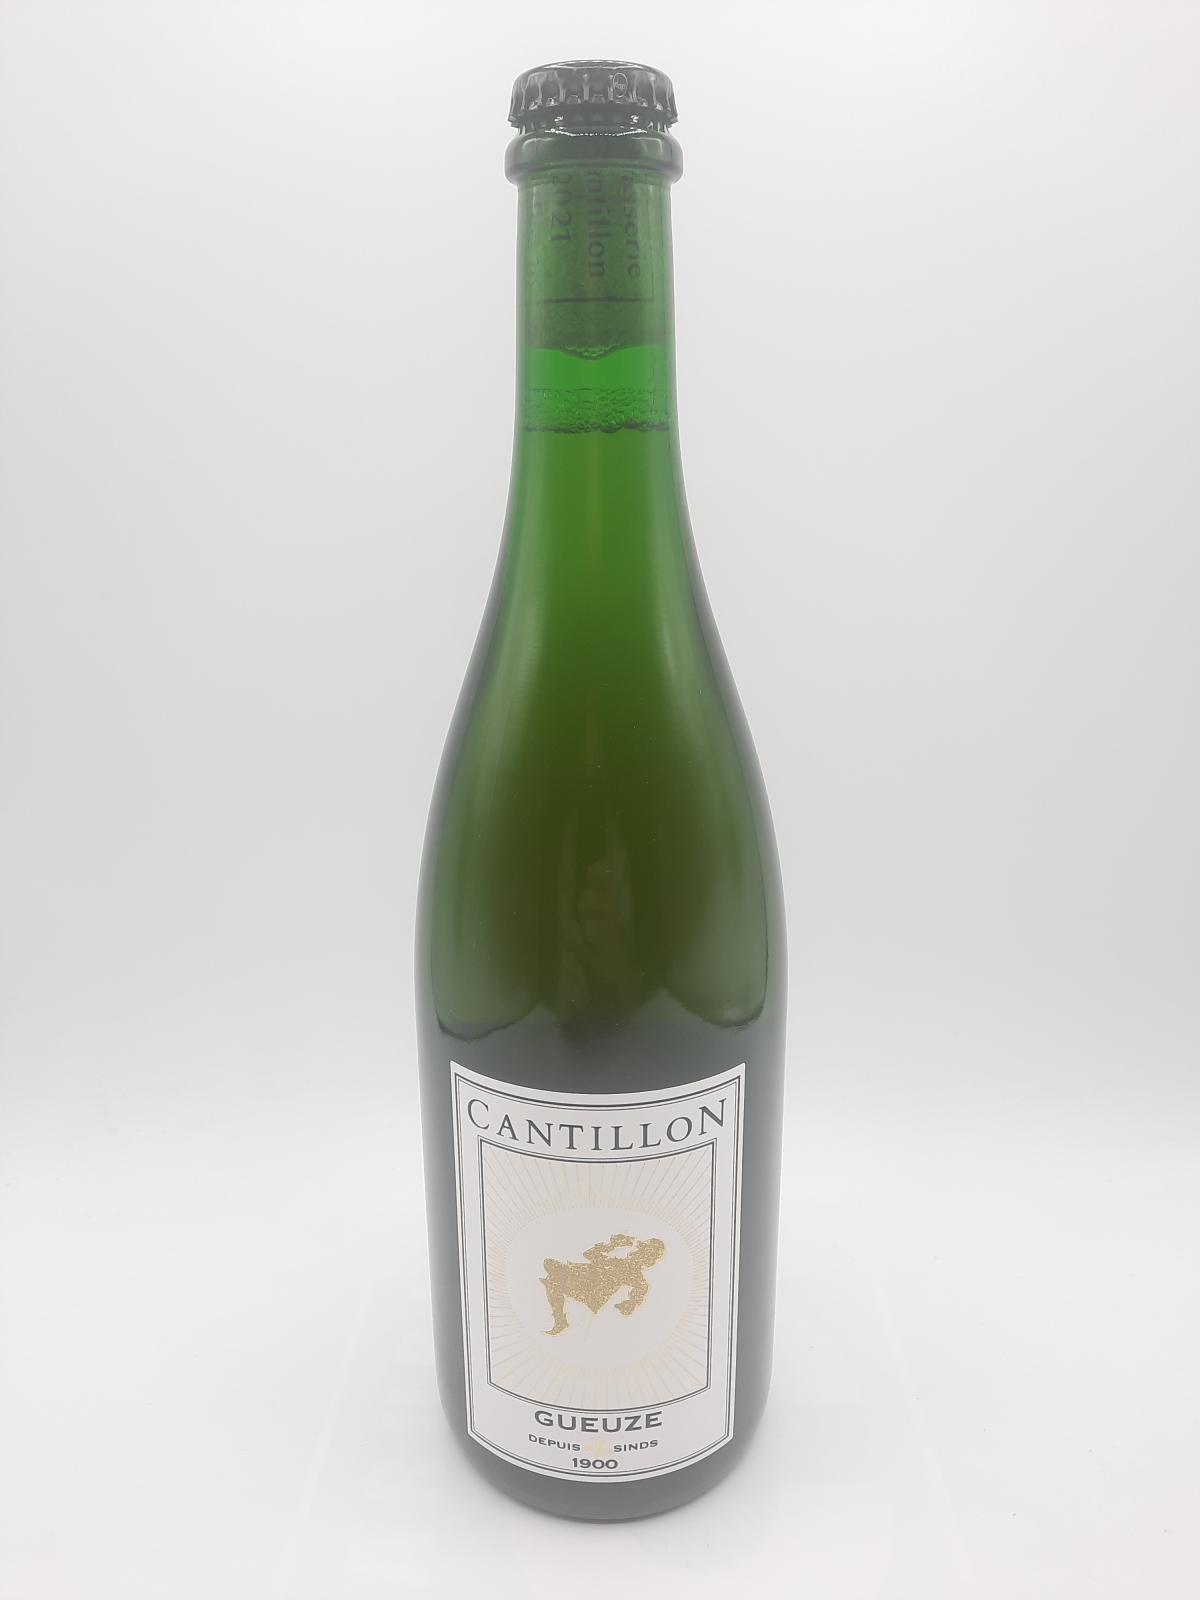 Image Cantillon geuze 75cl